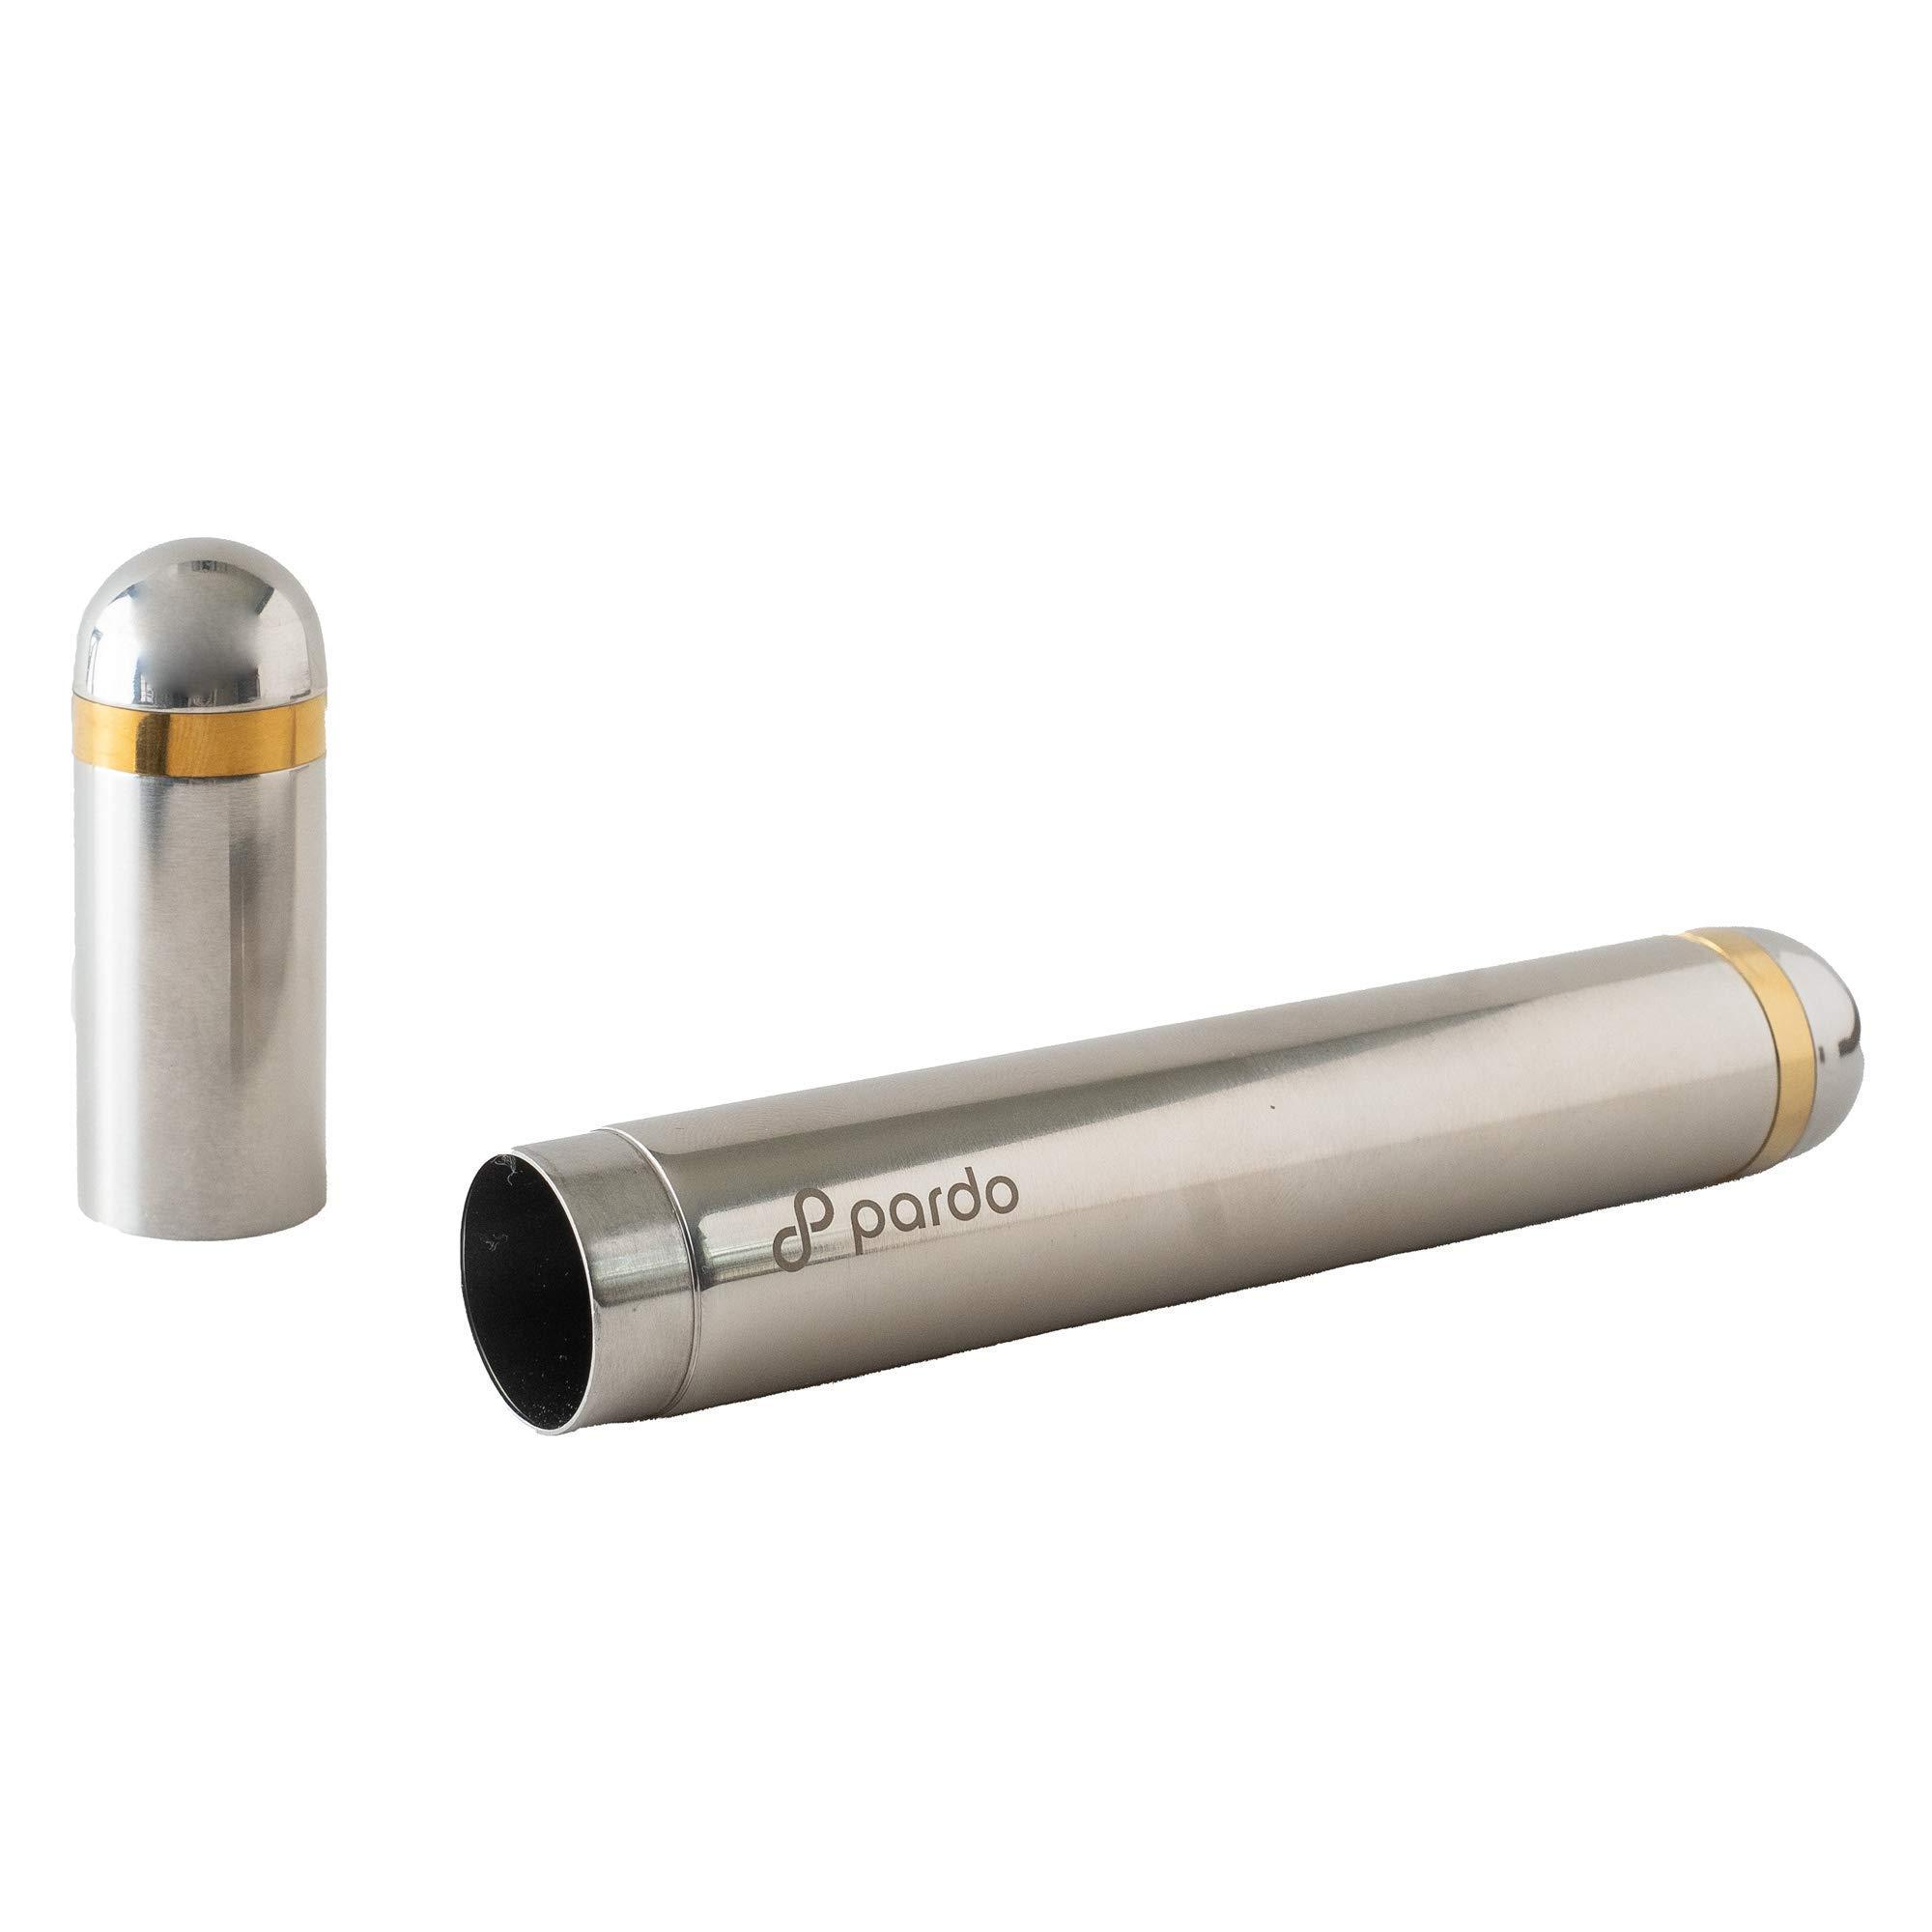 Pardo Cigar Tube - Stainless Steel PortableTravel Case - Large Ring Gauge Cigars